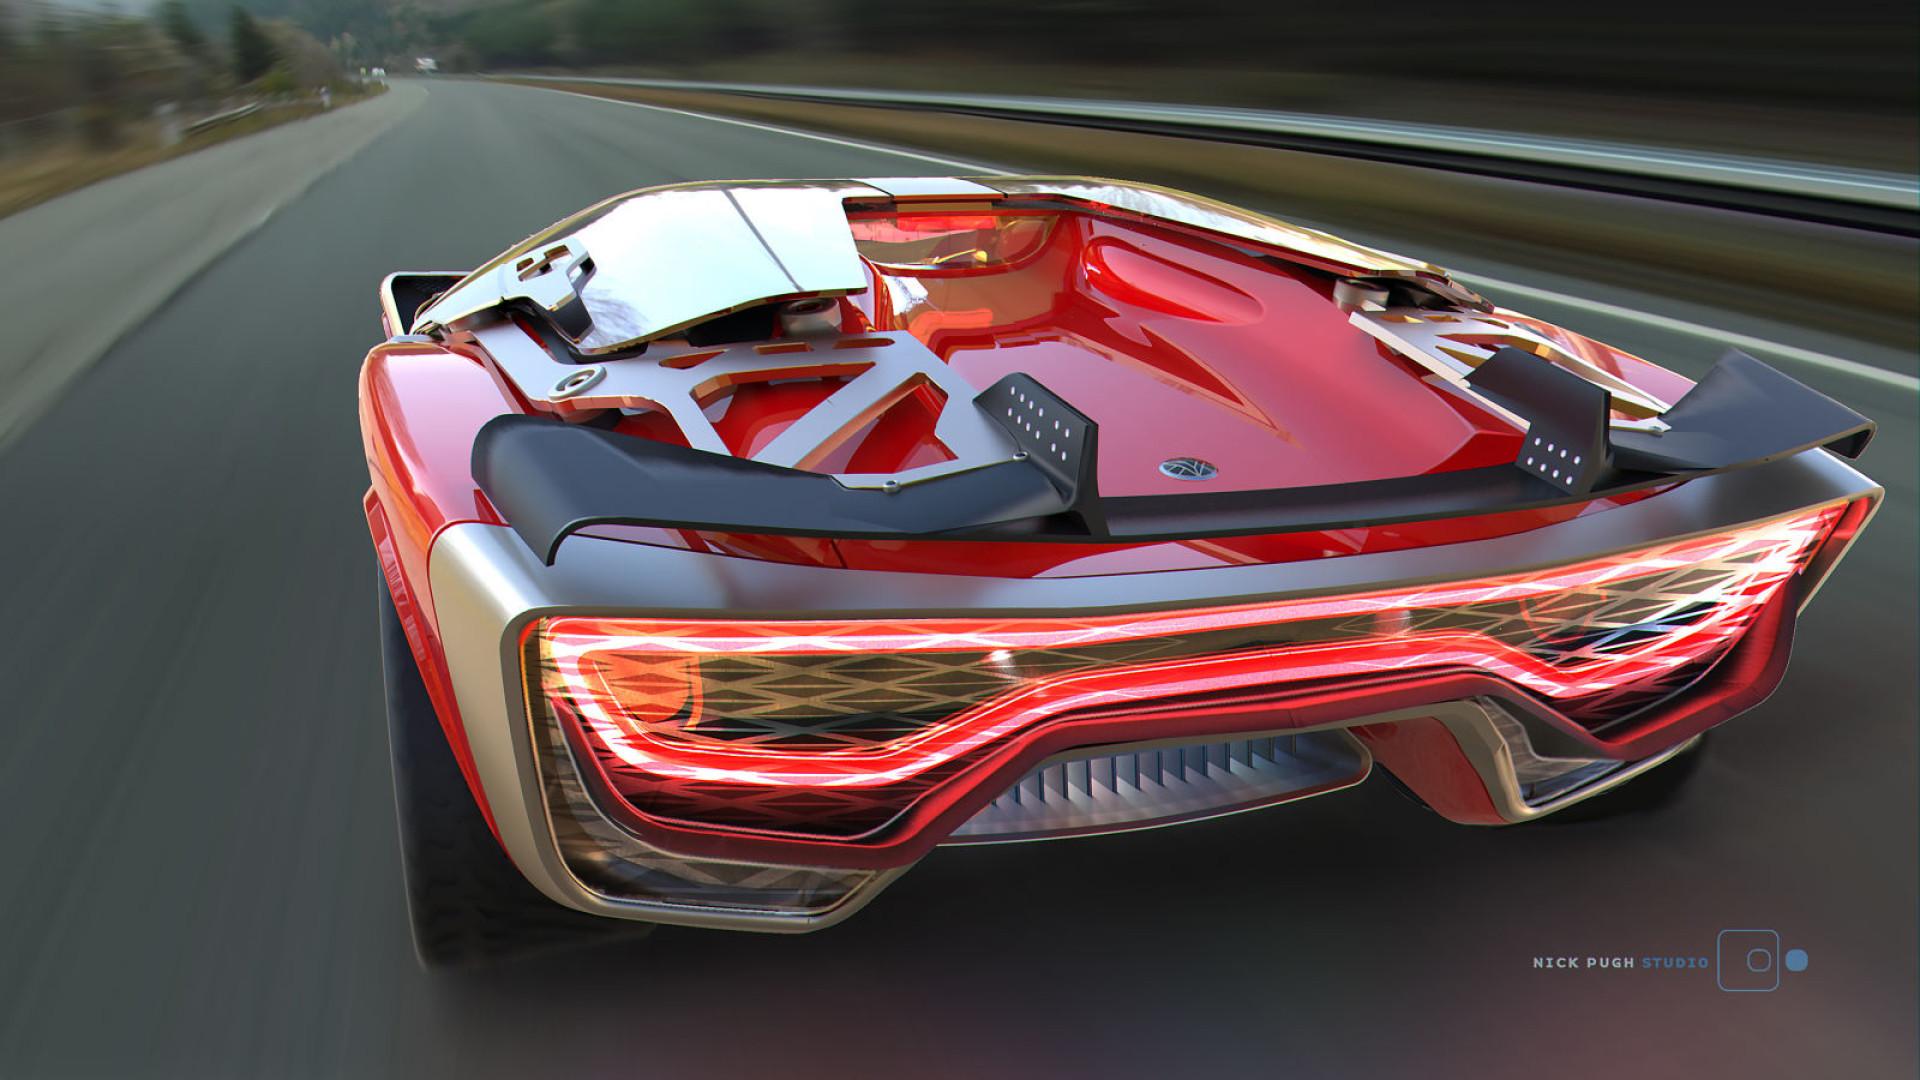 'Concept' do supercarro autónomo do futuro quer continuar a ser divertido